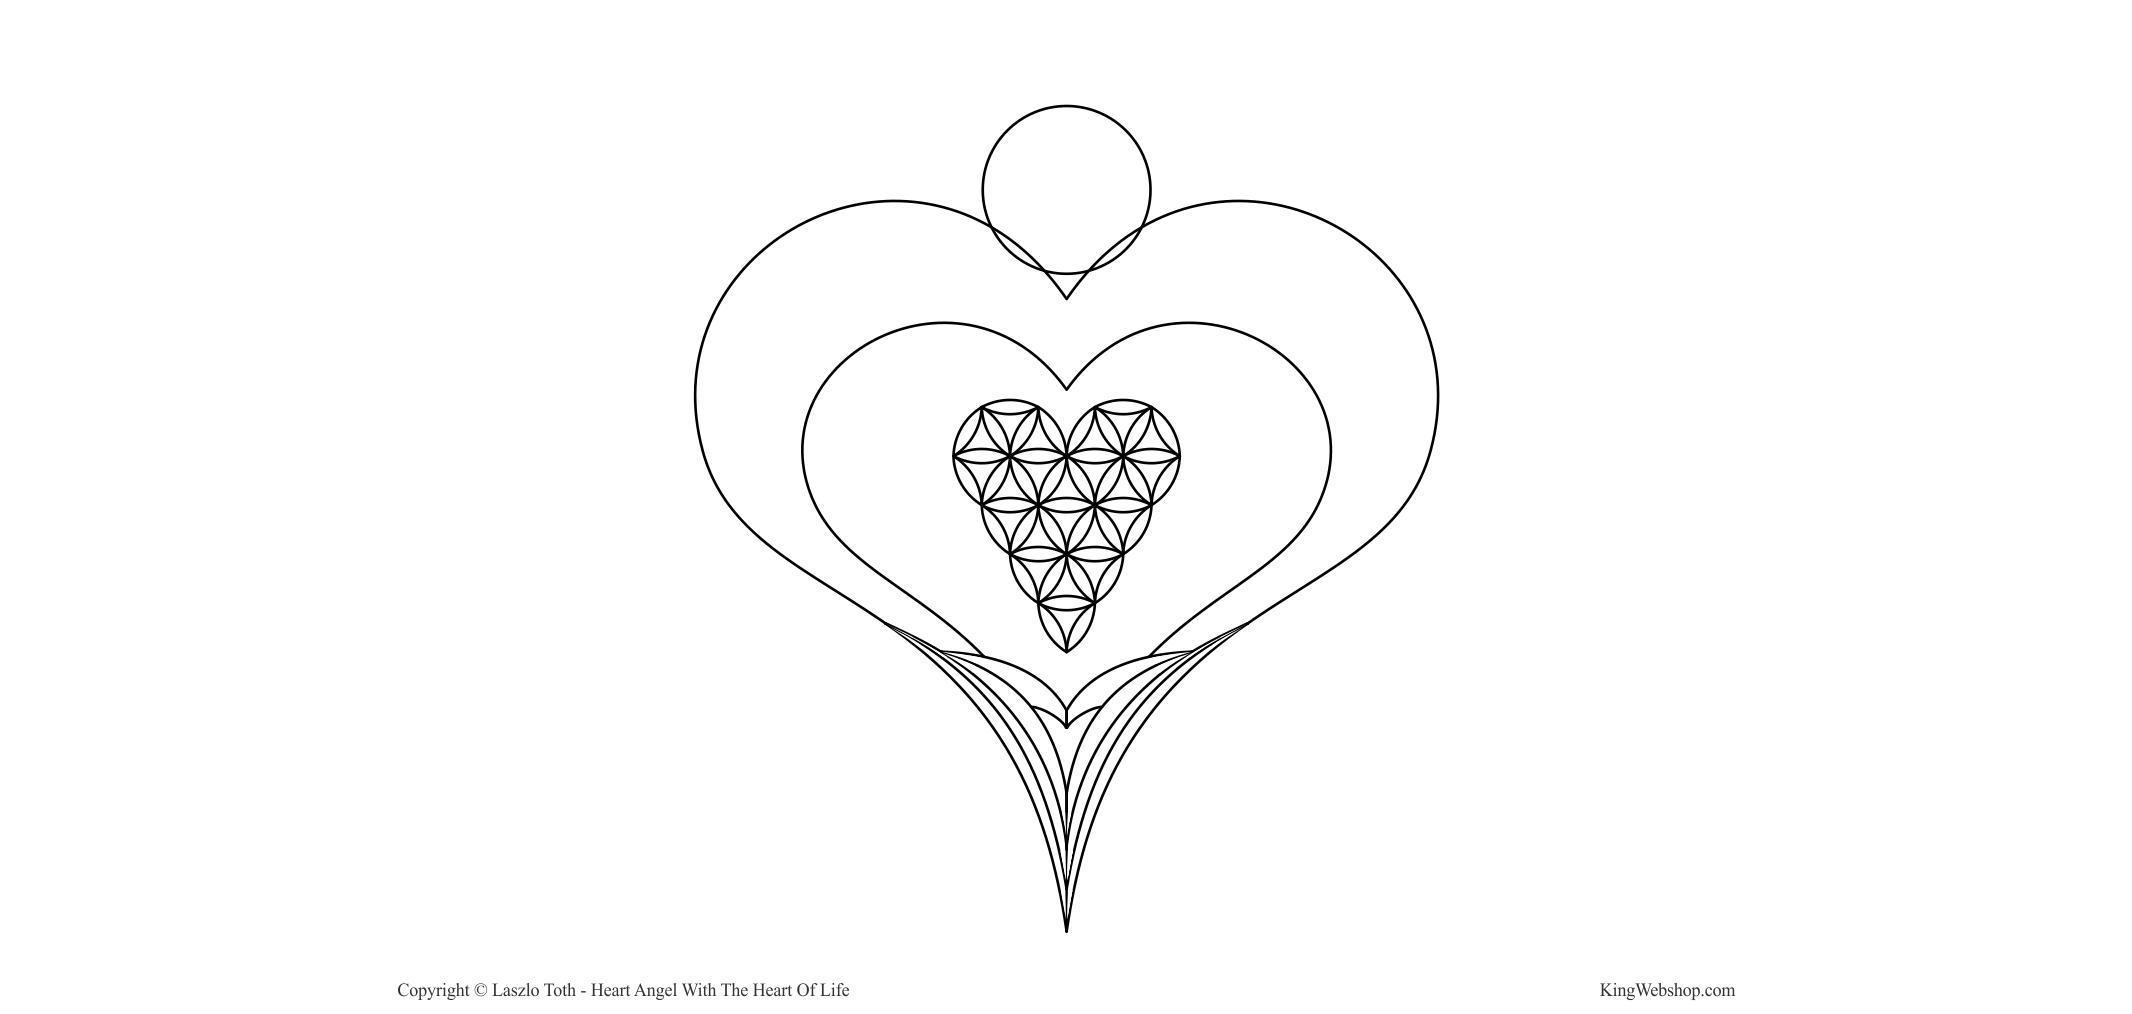 Heart Angel – With The Heart Of Life – KingWebshop – Header image logo